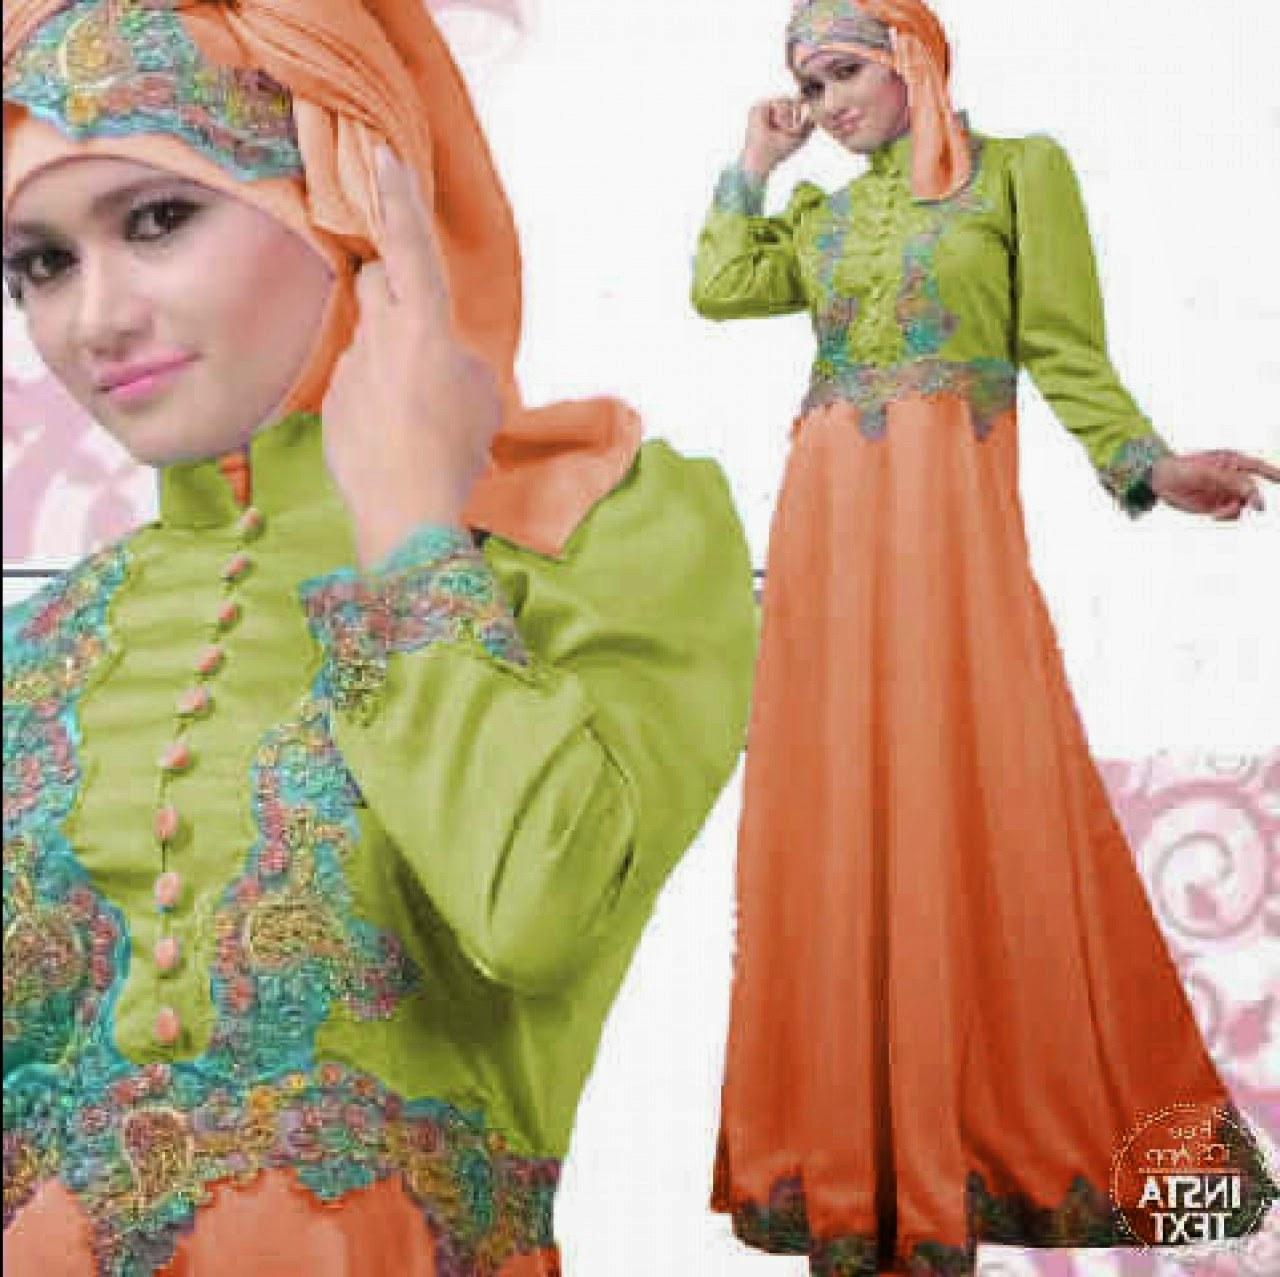 Design Model Baju Lebaran 2018 Dwdk Kumpulan Foto Model Baju Kebaya Lebaran Terbaru 2018